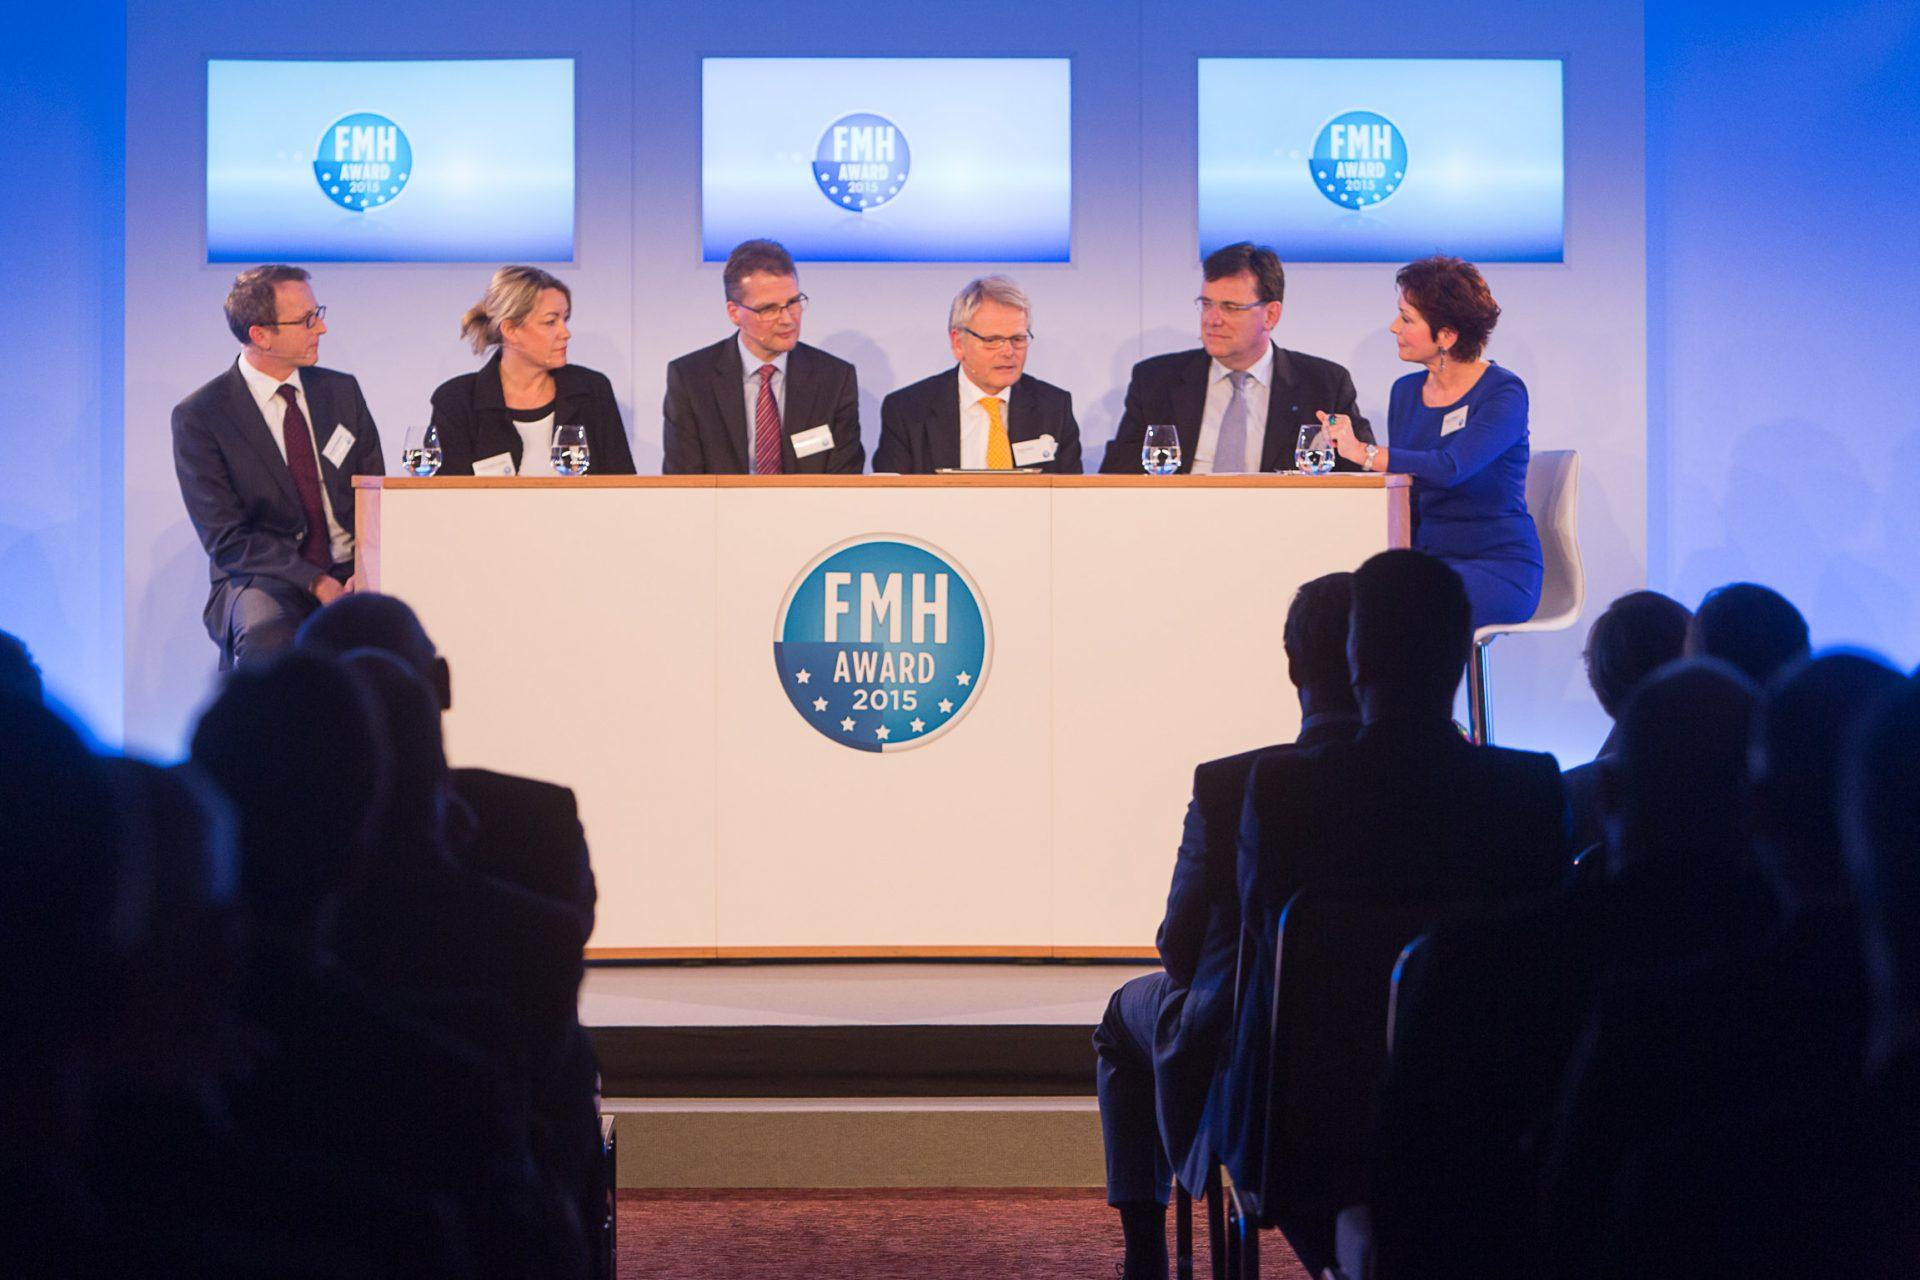 Podiumsdiskussion FMH Award